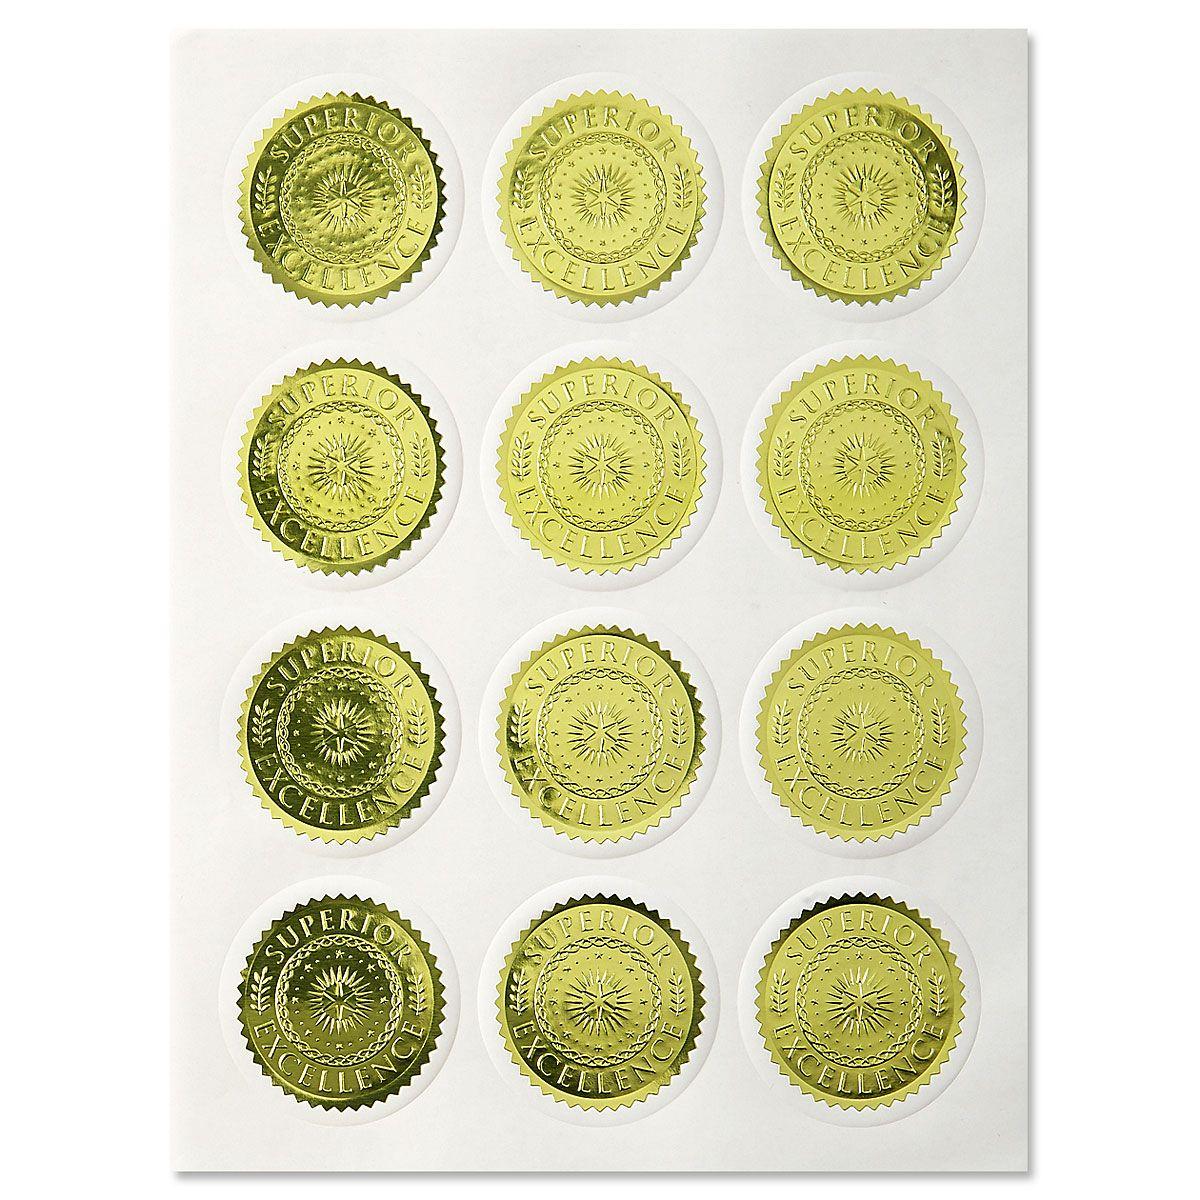 Gold Foil Excellence Certificate Seals